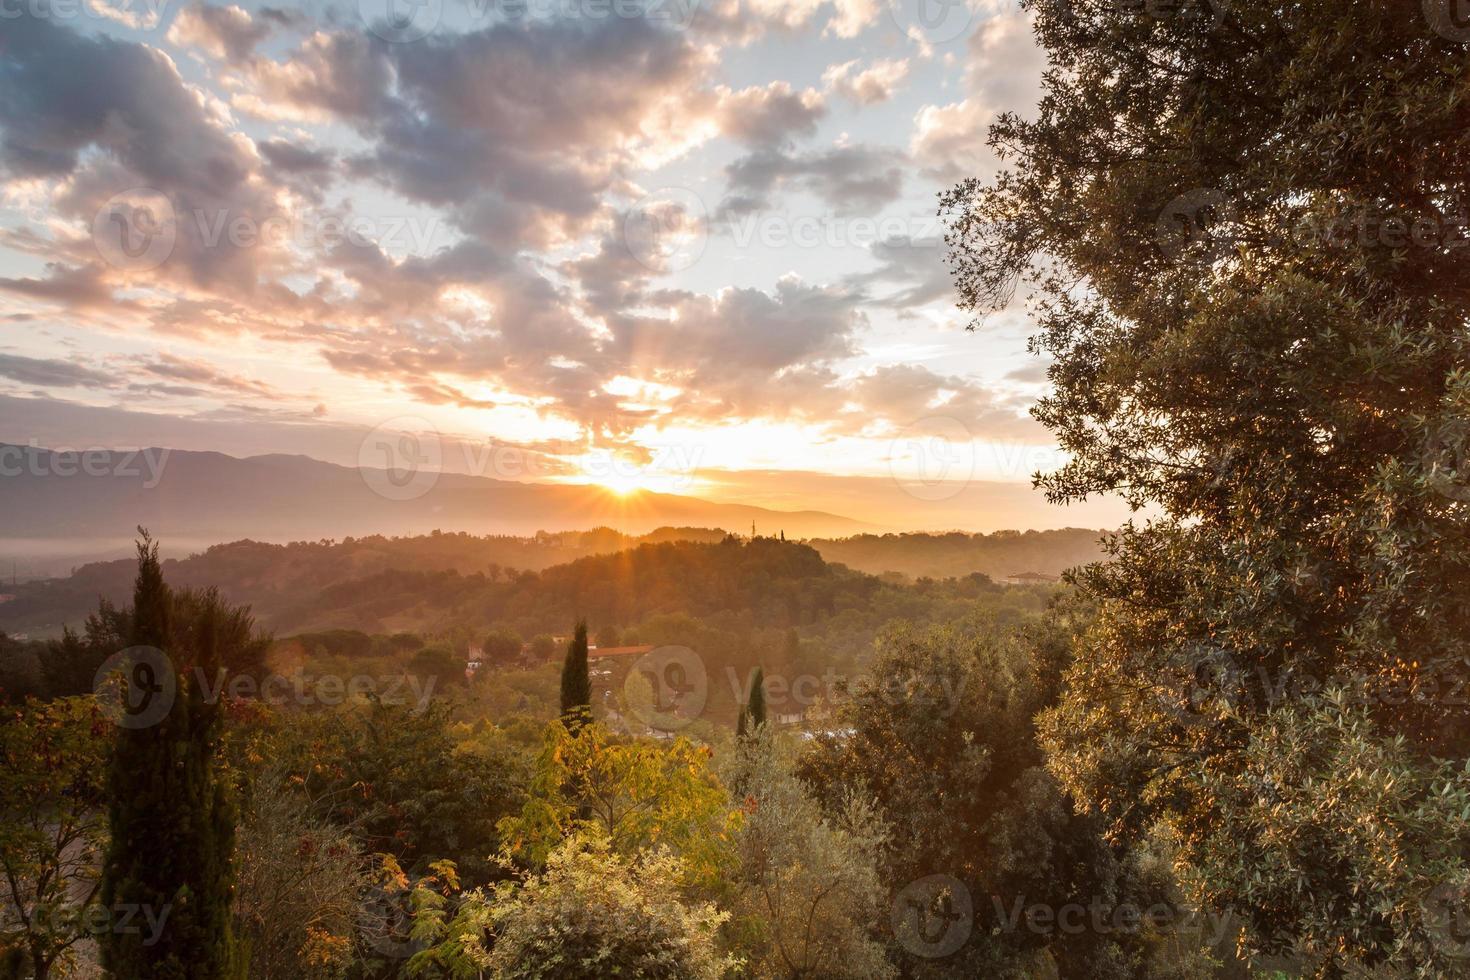 Region hills at sunset in Tuscany - Italy photo